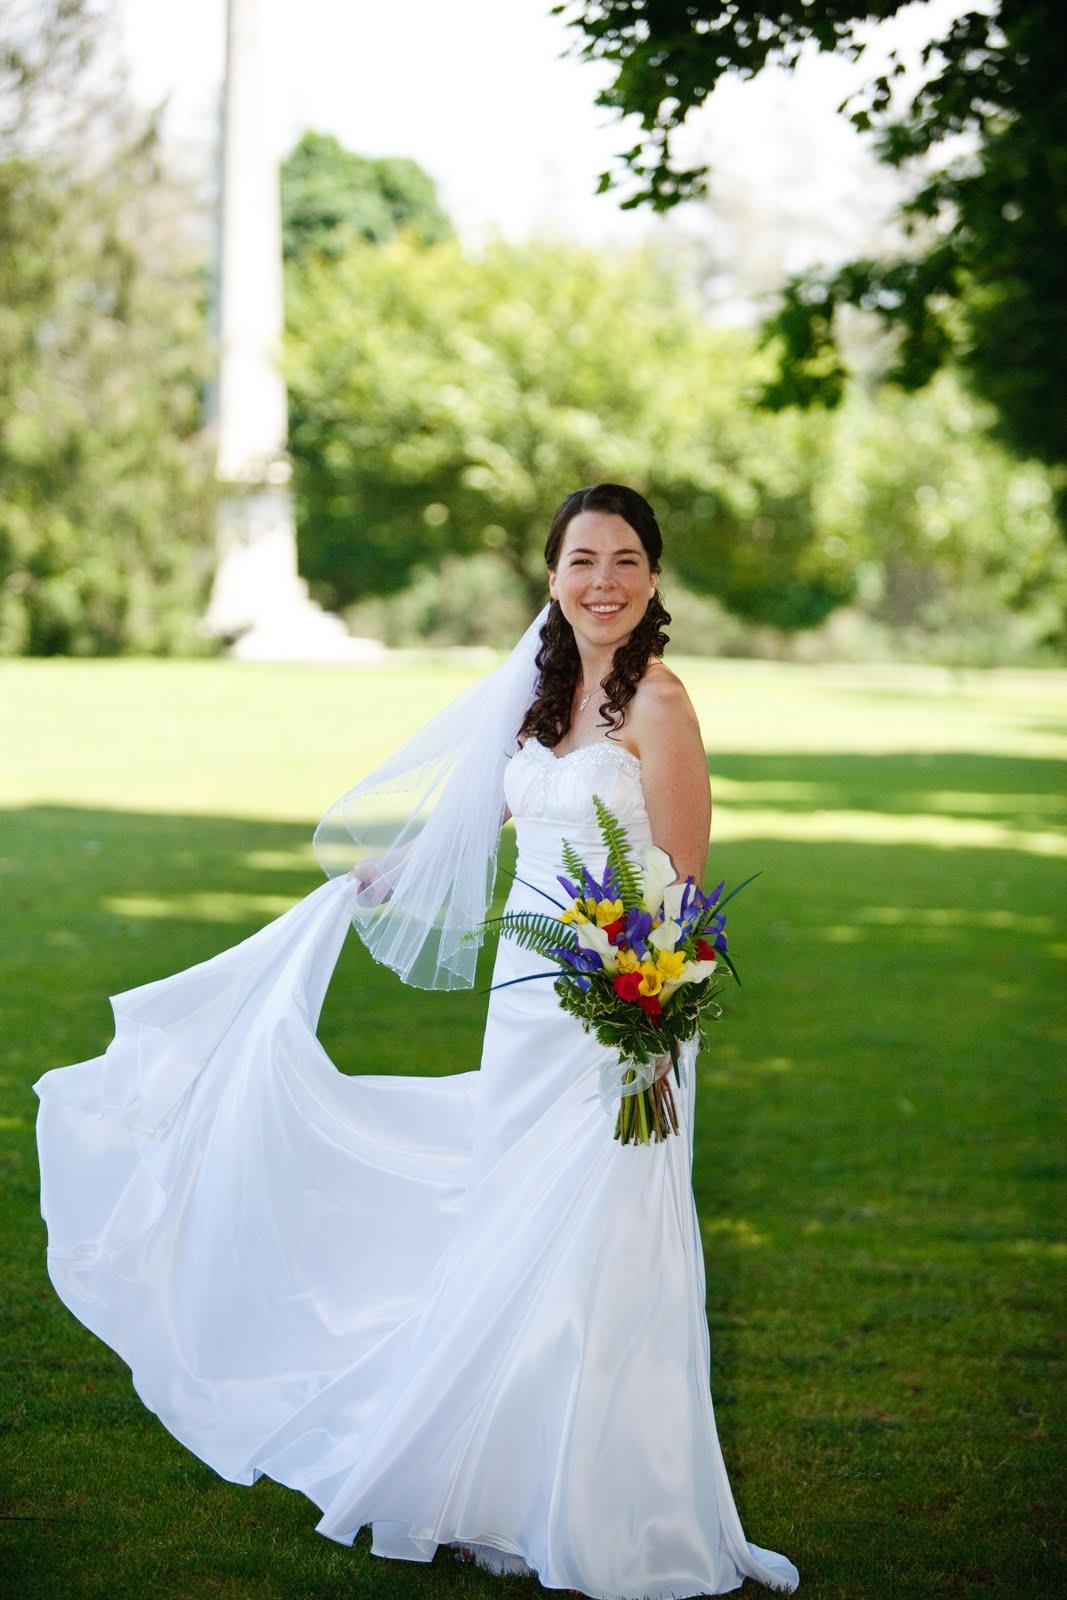 Shawn Johnson Wedding.Cable Photography Video Whitney Reagan Shawn Kelley Wedding